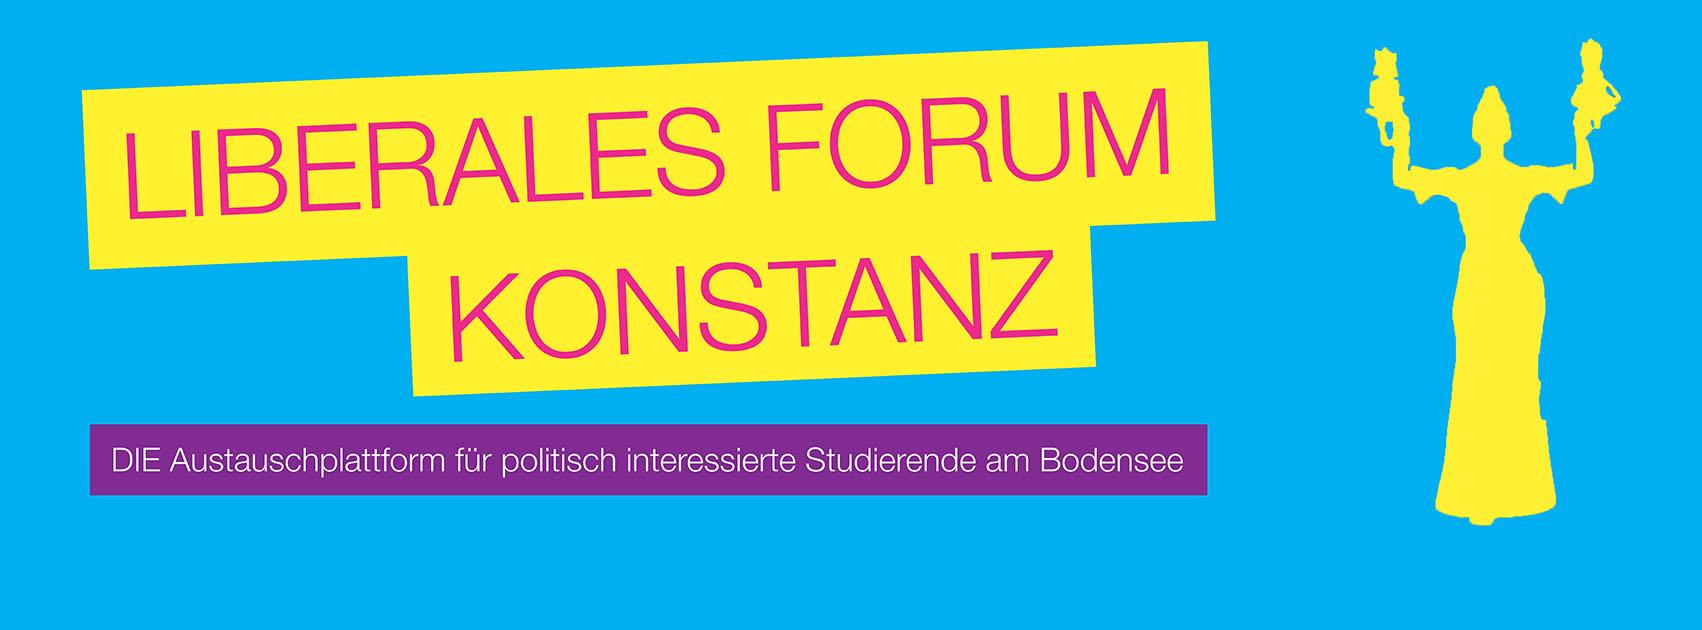 Liberales Forum Konstanz